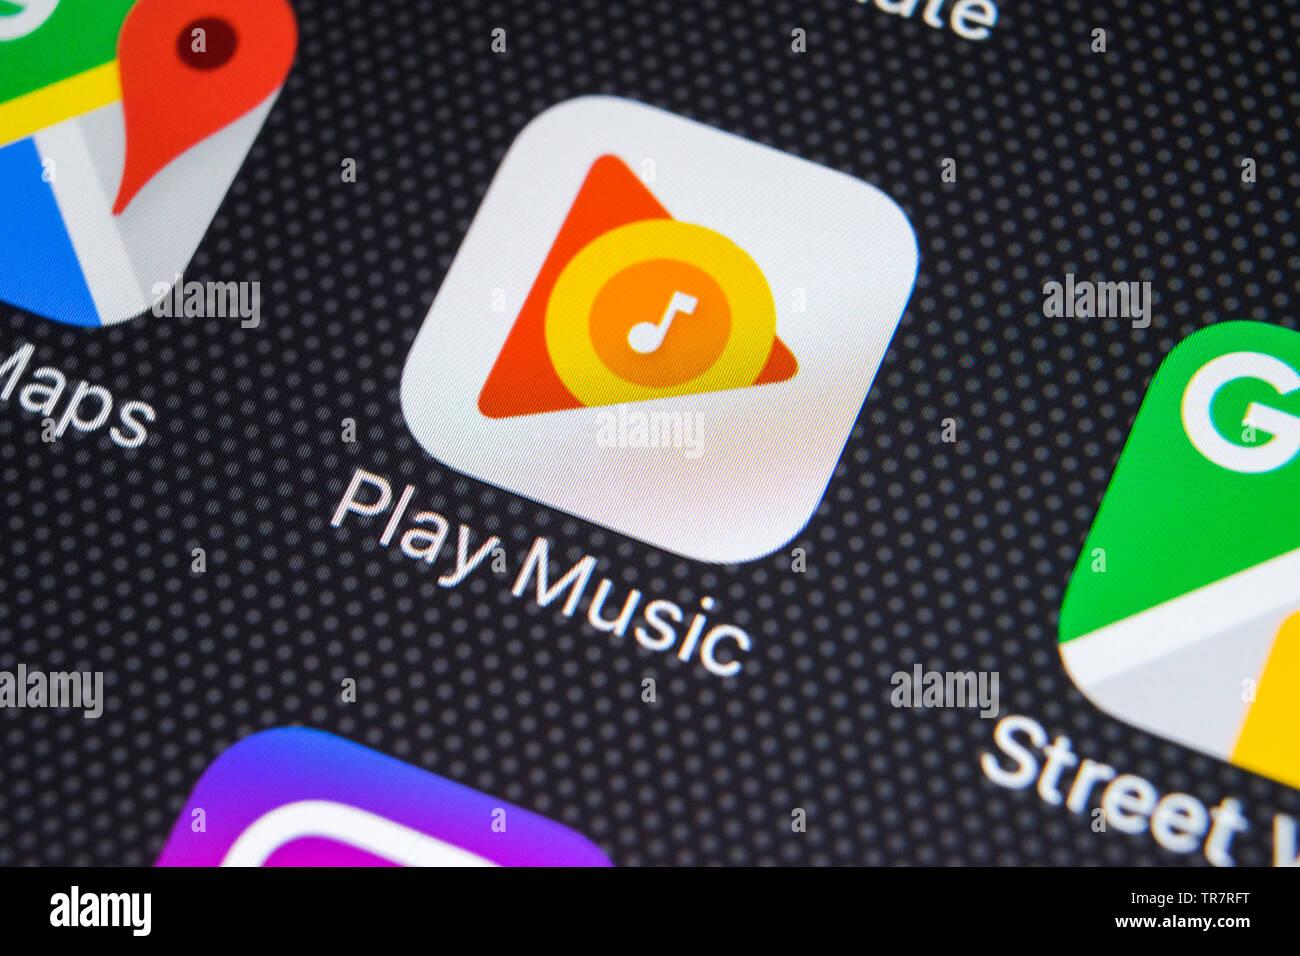 Google Play Music Stock Photos & Google Play Music Stock